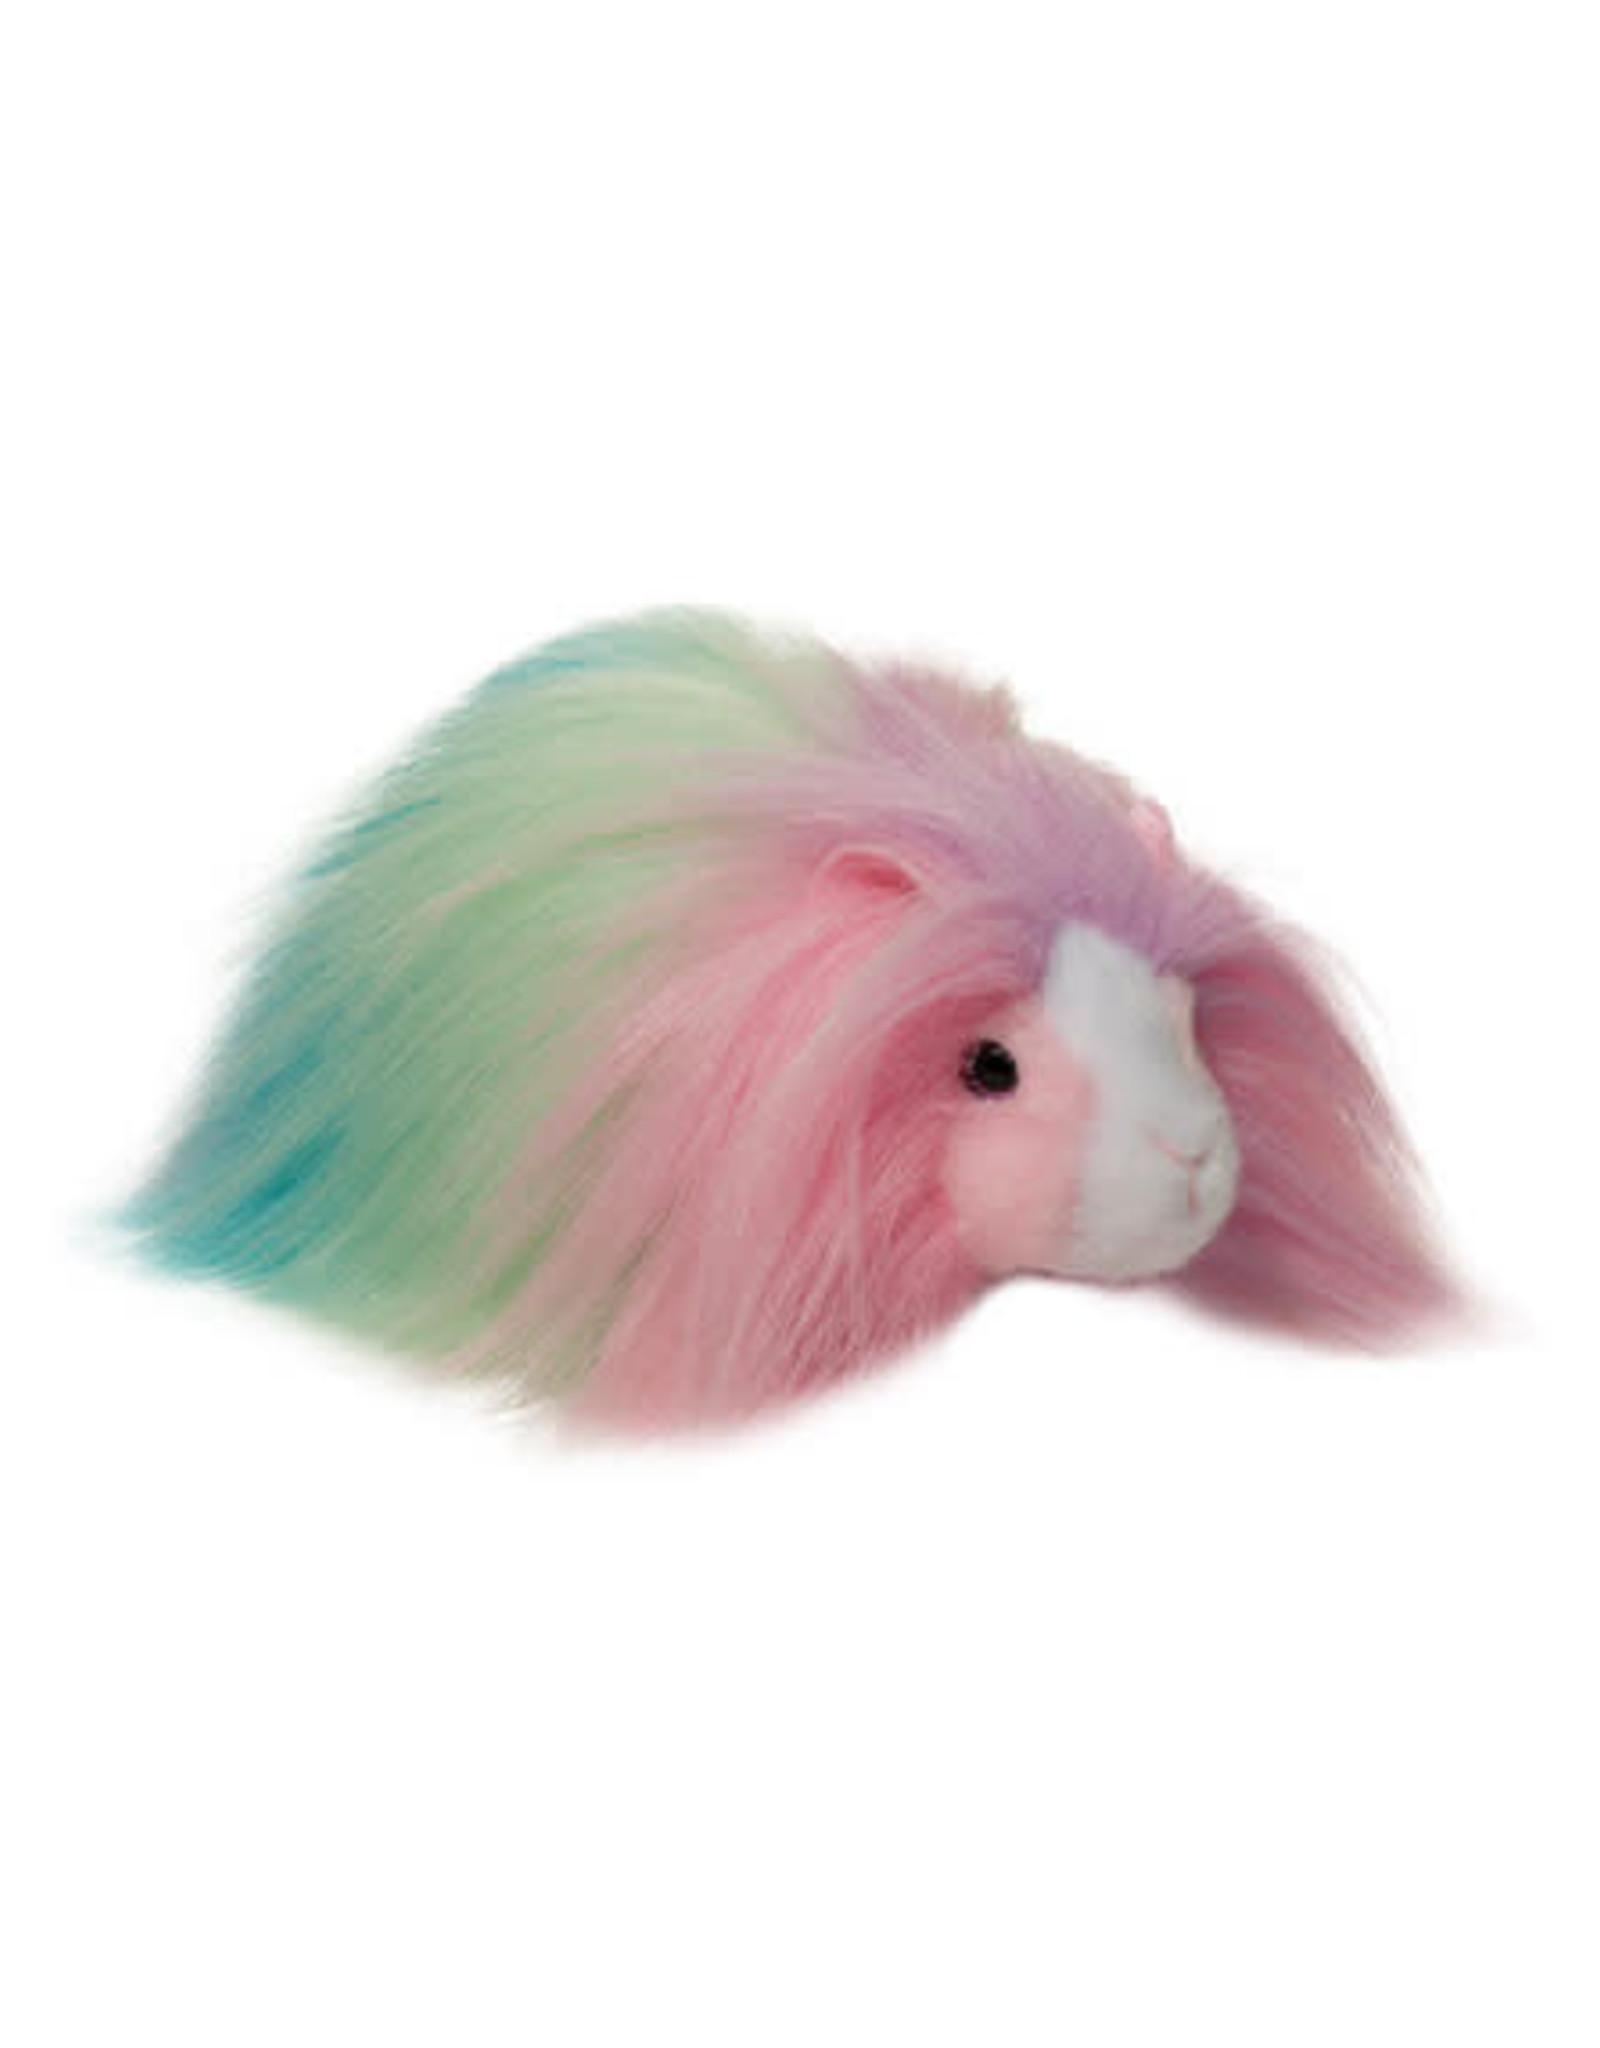 Douglas Cheesecake Rainbow Guinea Pig*